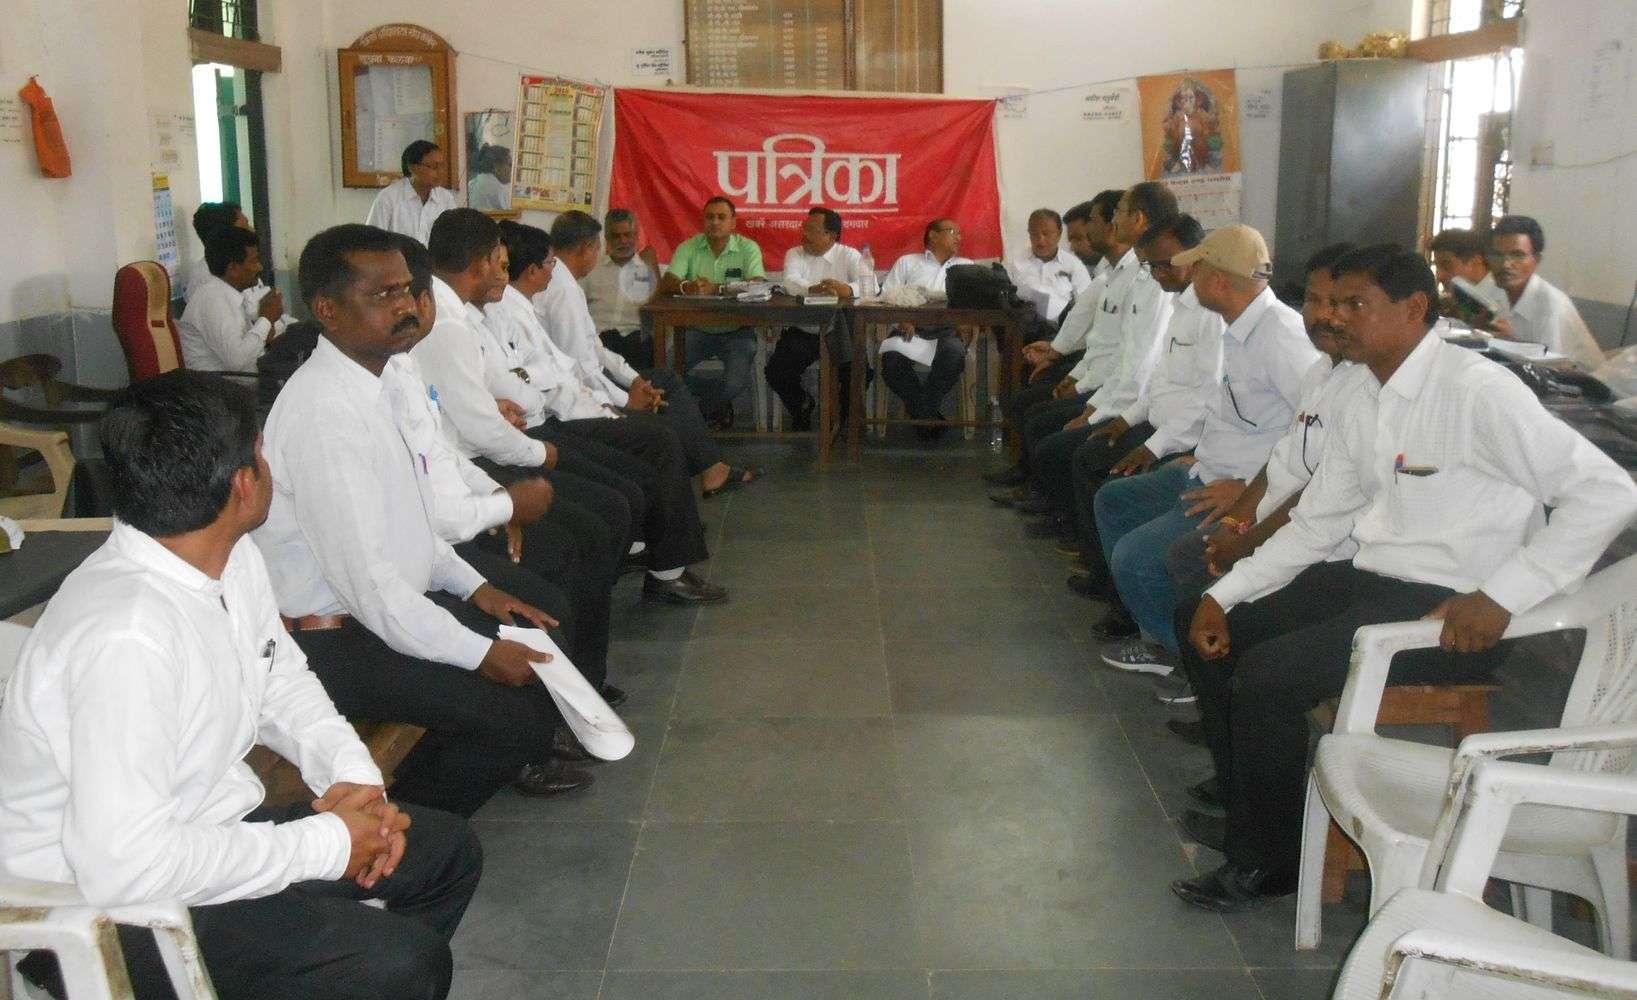 rajasthan patrika change maker campaign